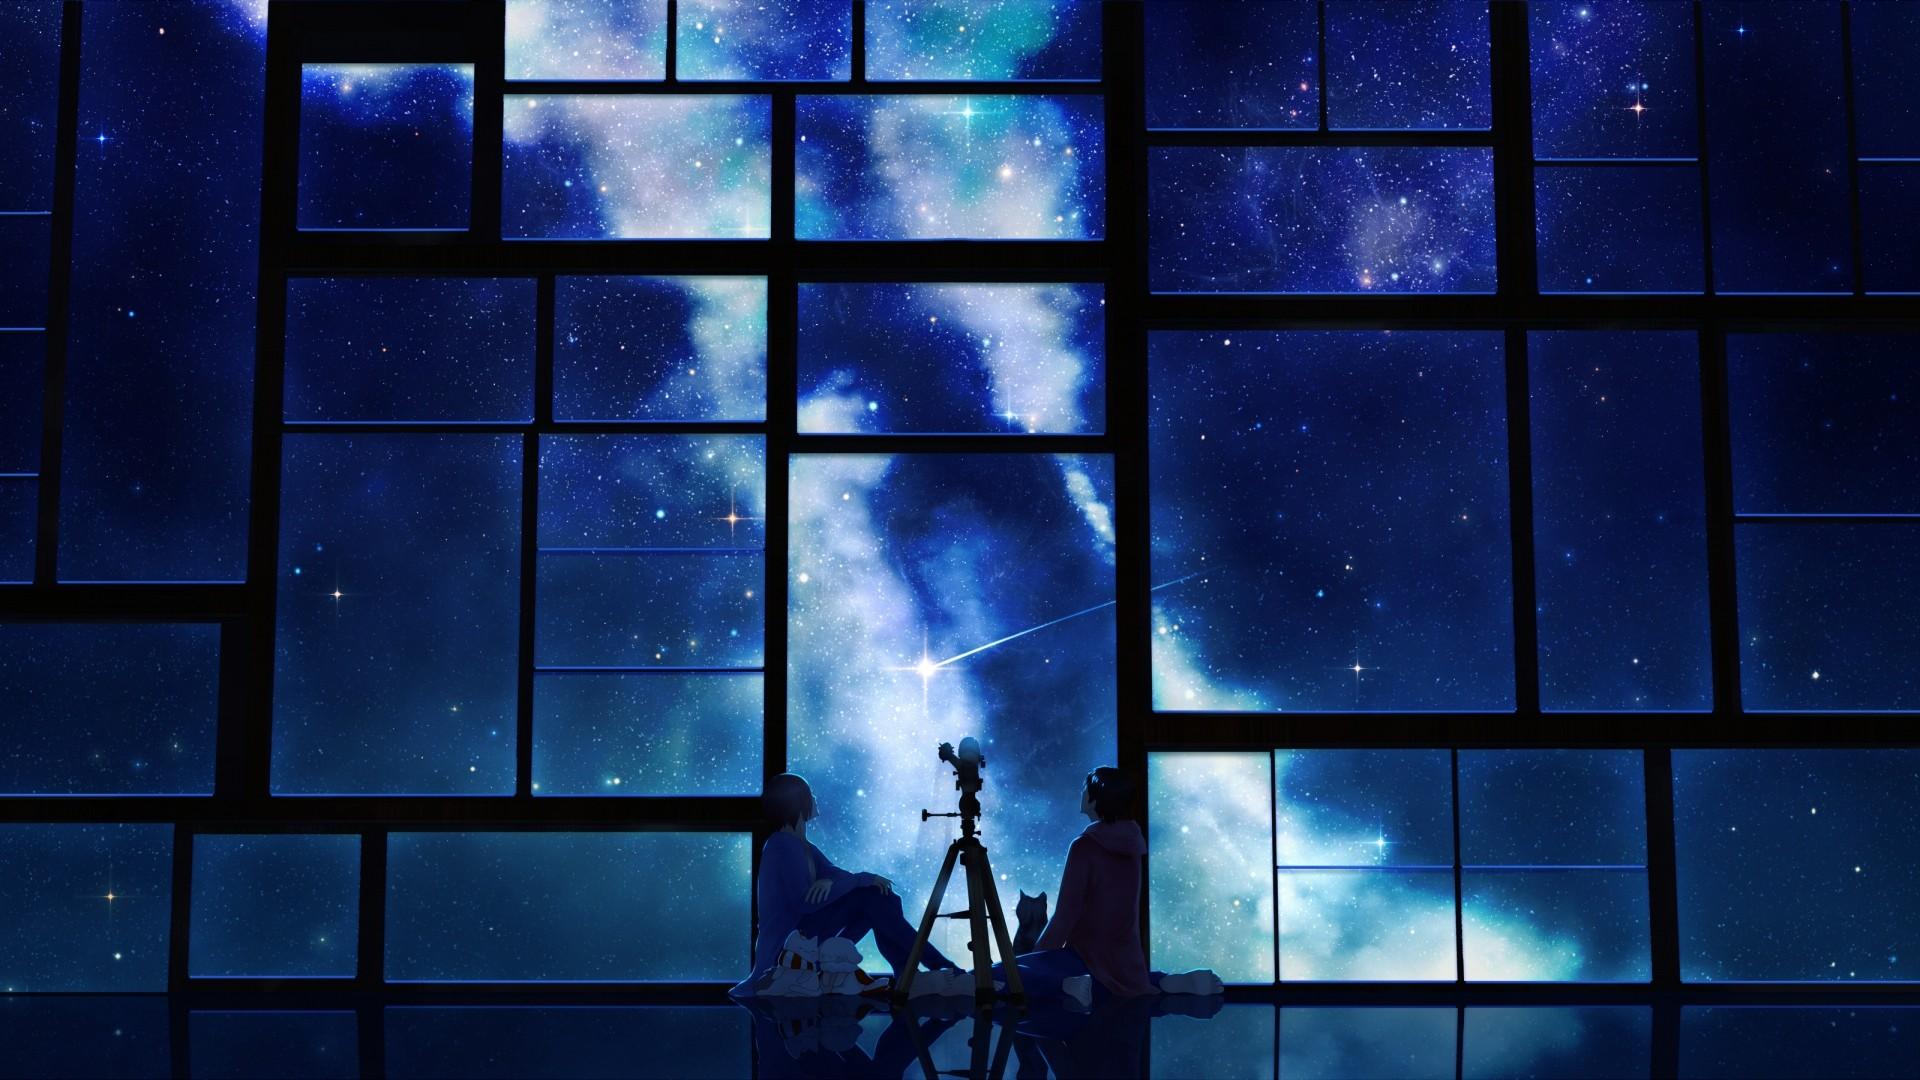 Preview wallpaper tamagosho, sky, stars, telescope, night, window 1920×1080